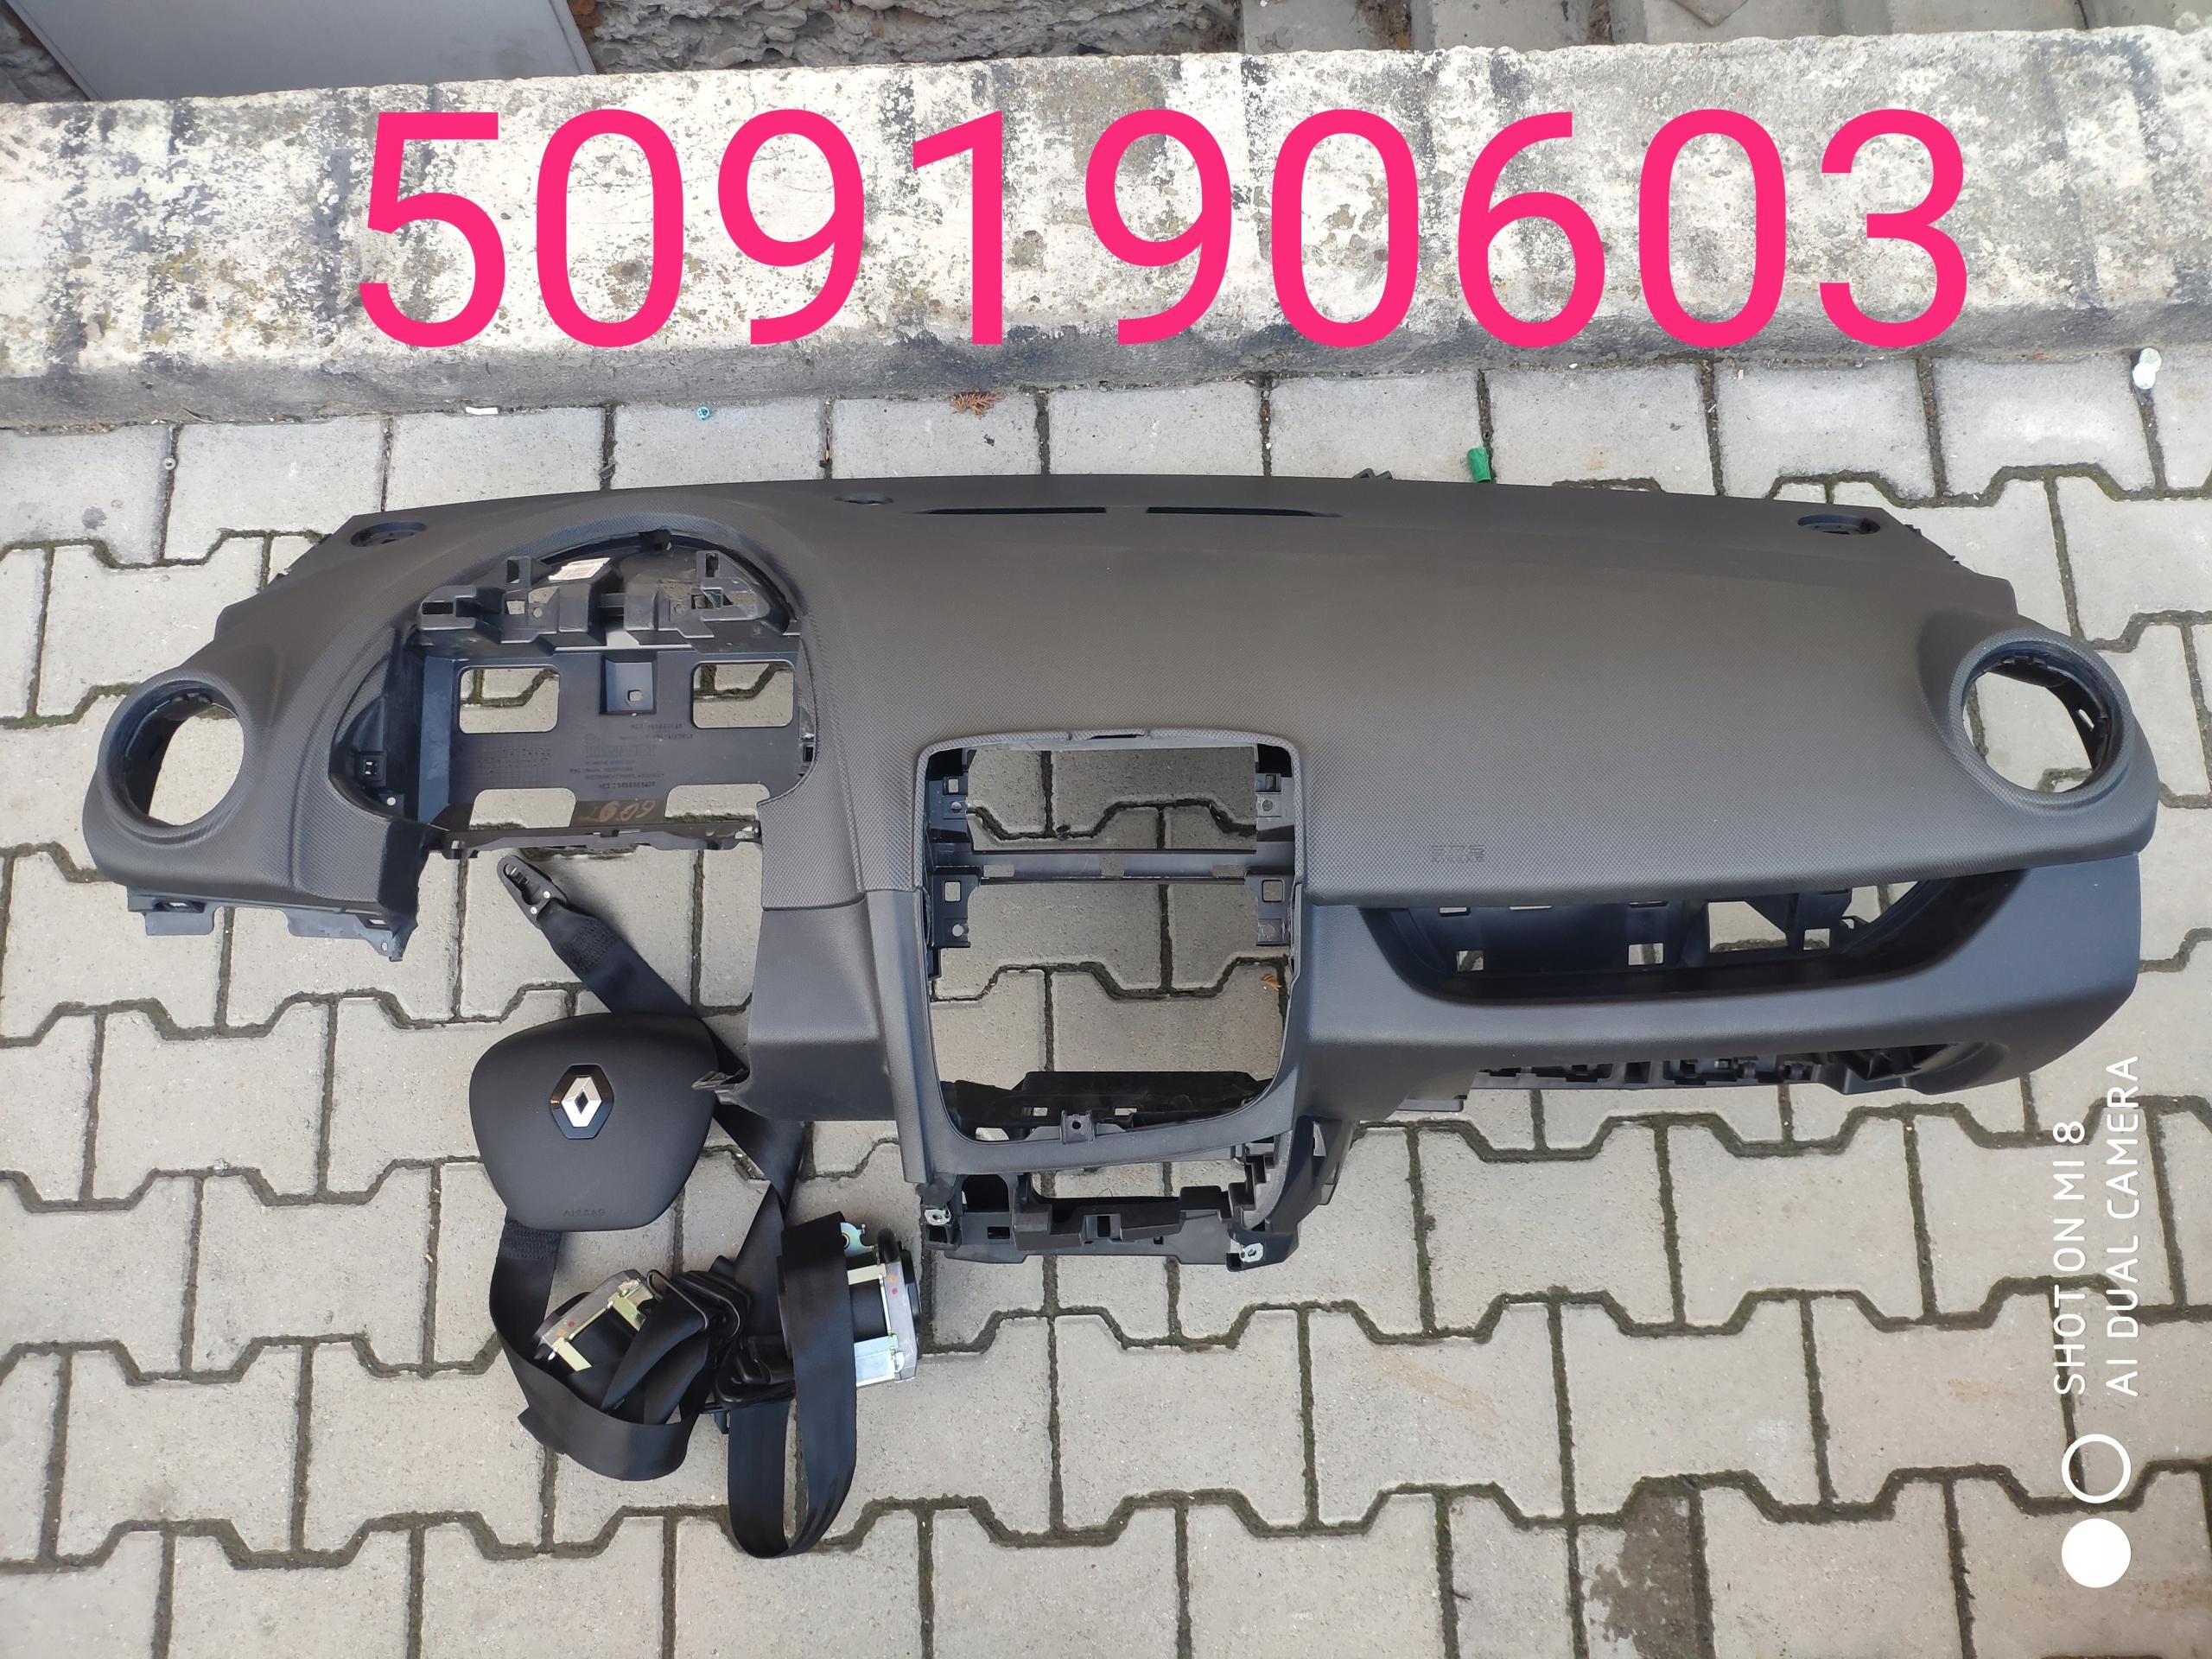 clio 4 iv доска airbag консоль кокпит ремни